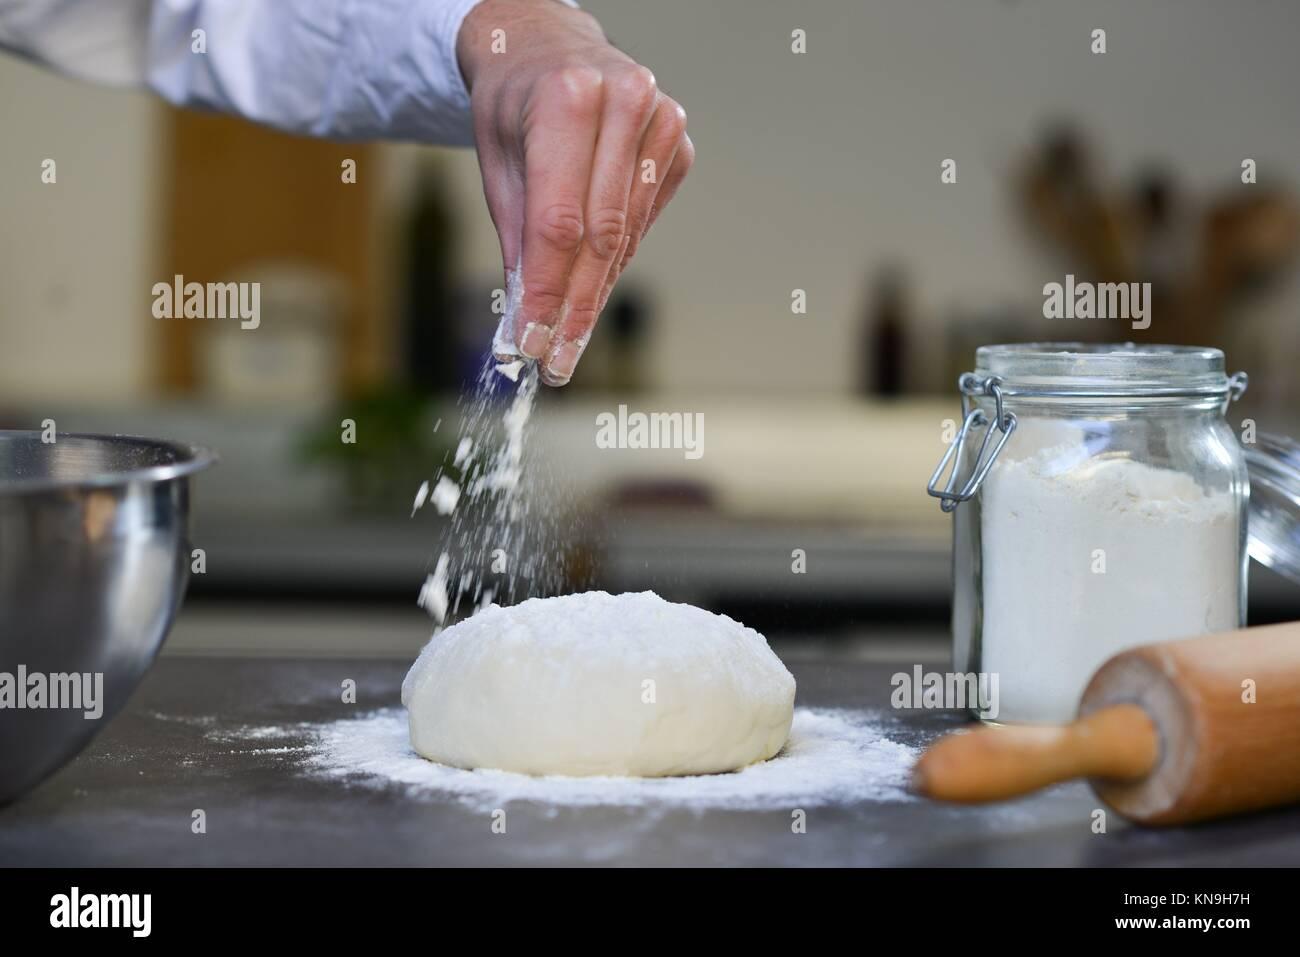 Chef preparing dough in kitchen flour douth Pizza. - Stock Image